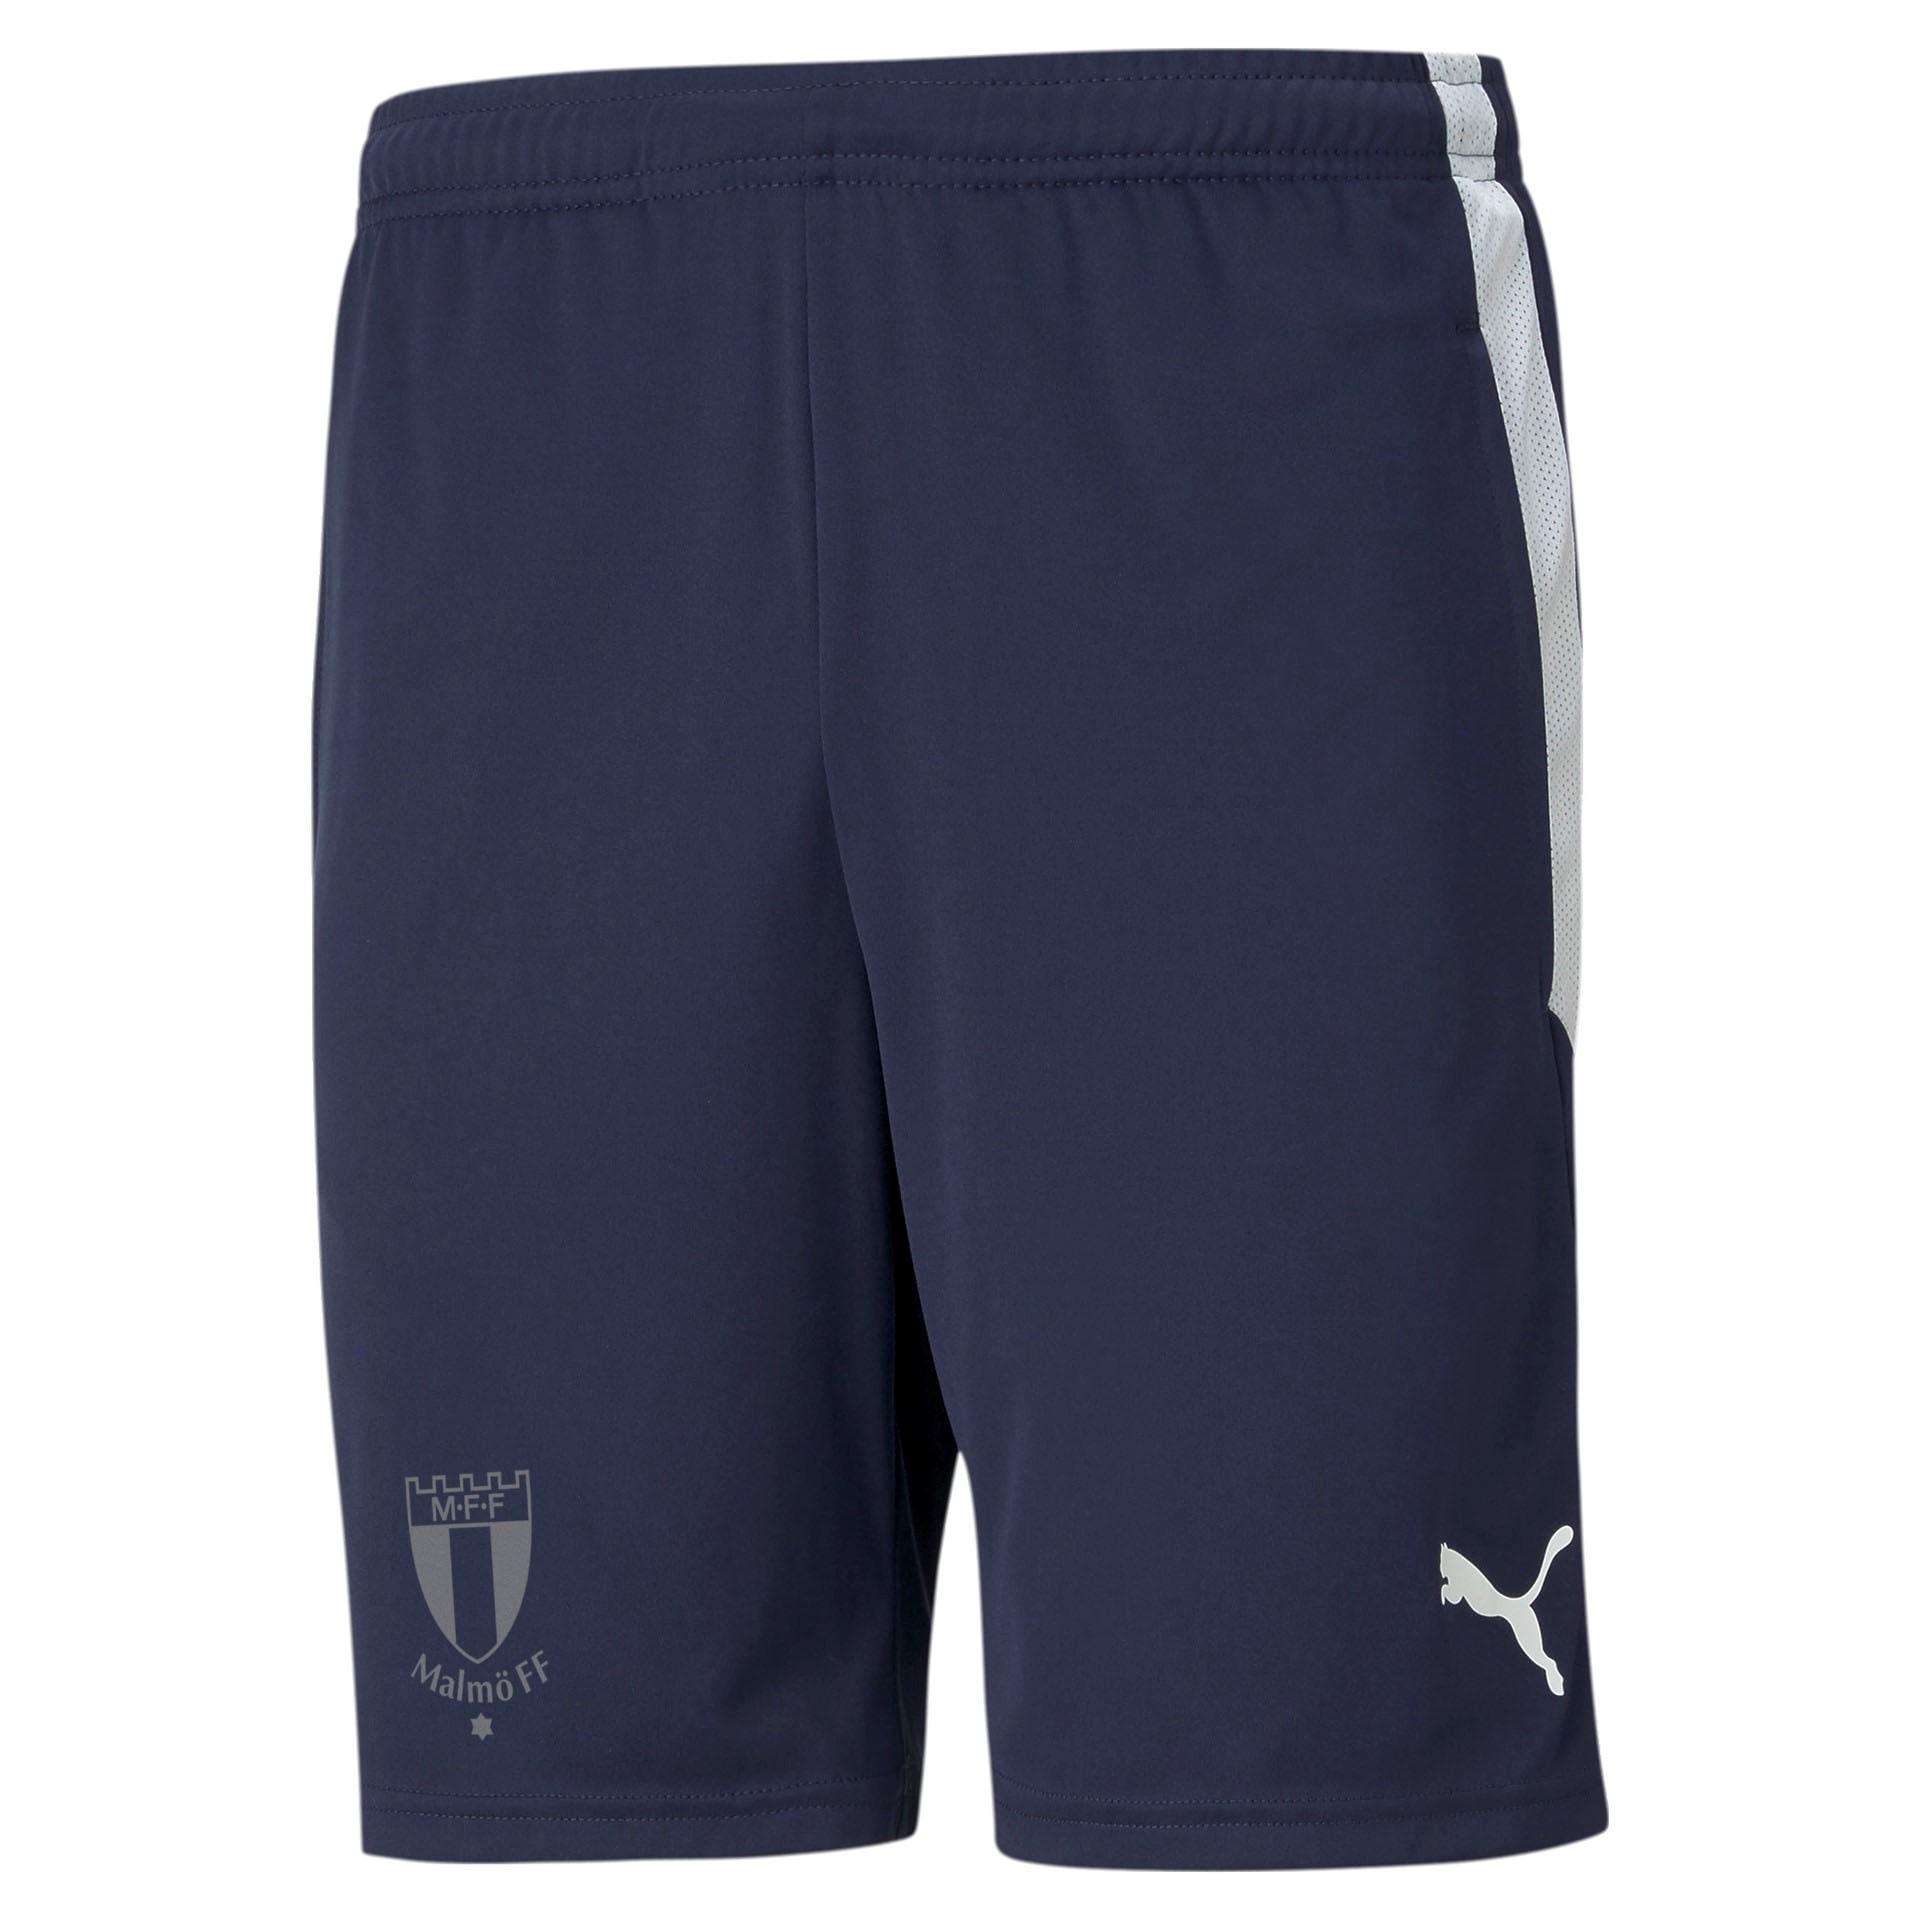 Puma teamliga tr shorts